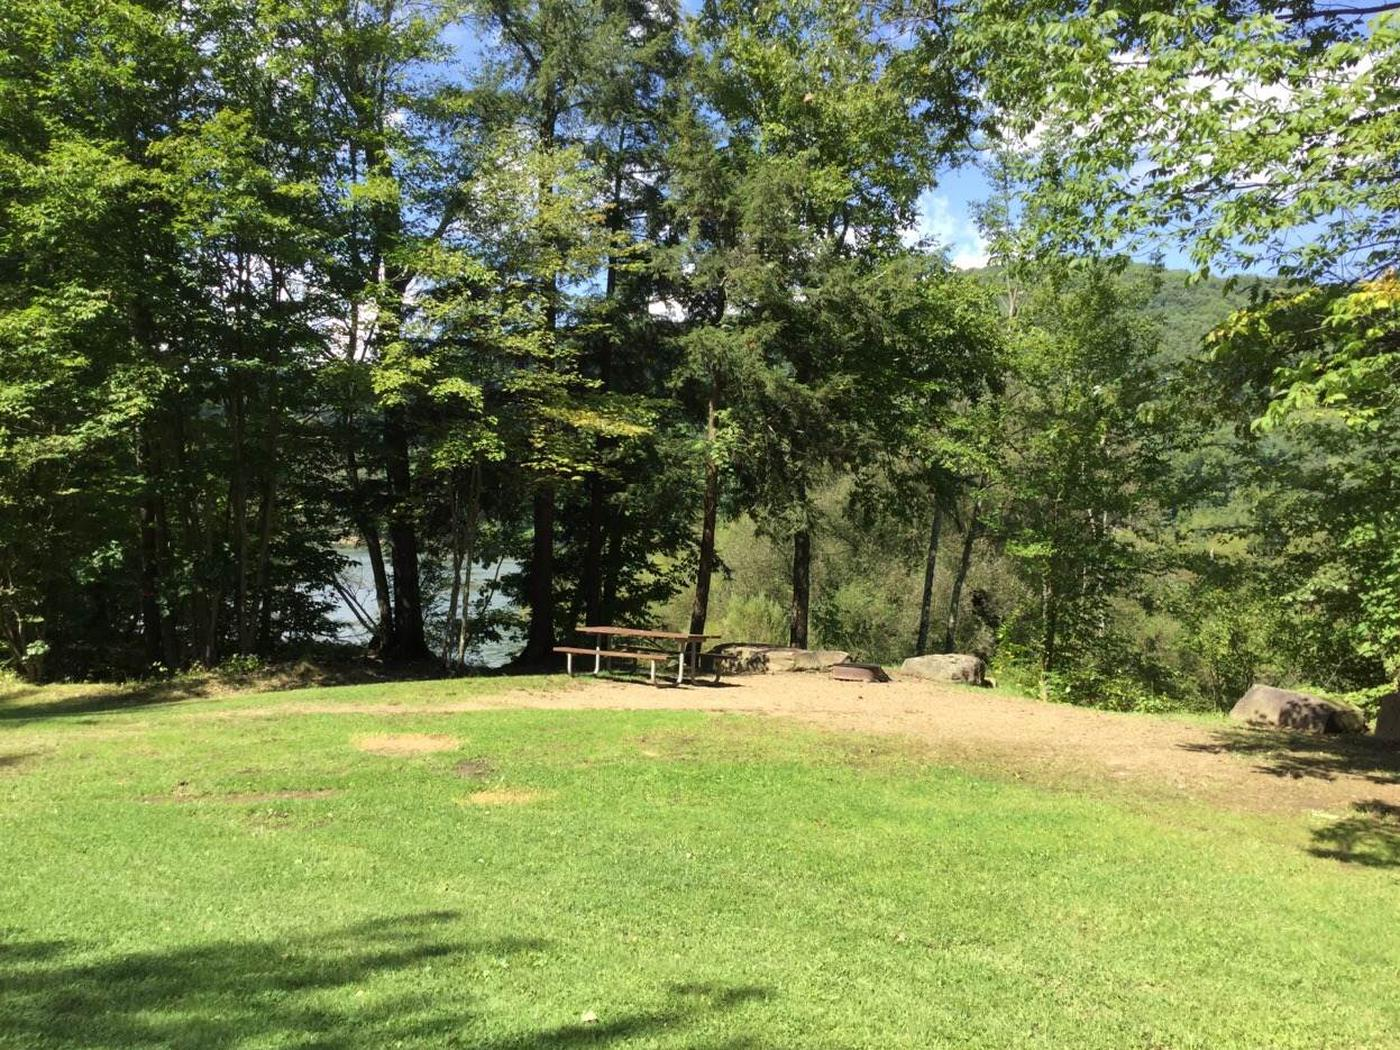 Willow Bay Recreation Area: Campsite 55